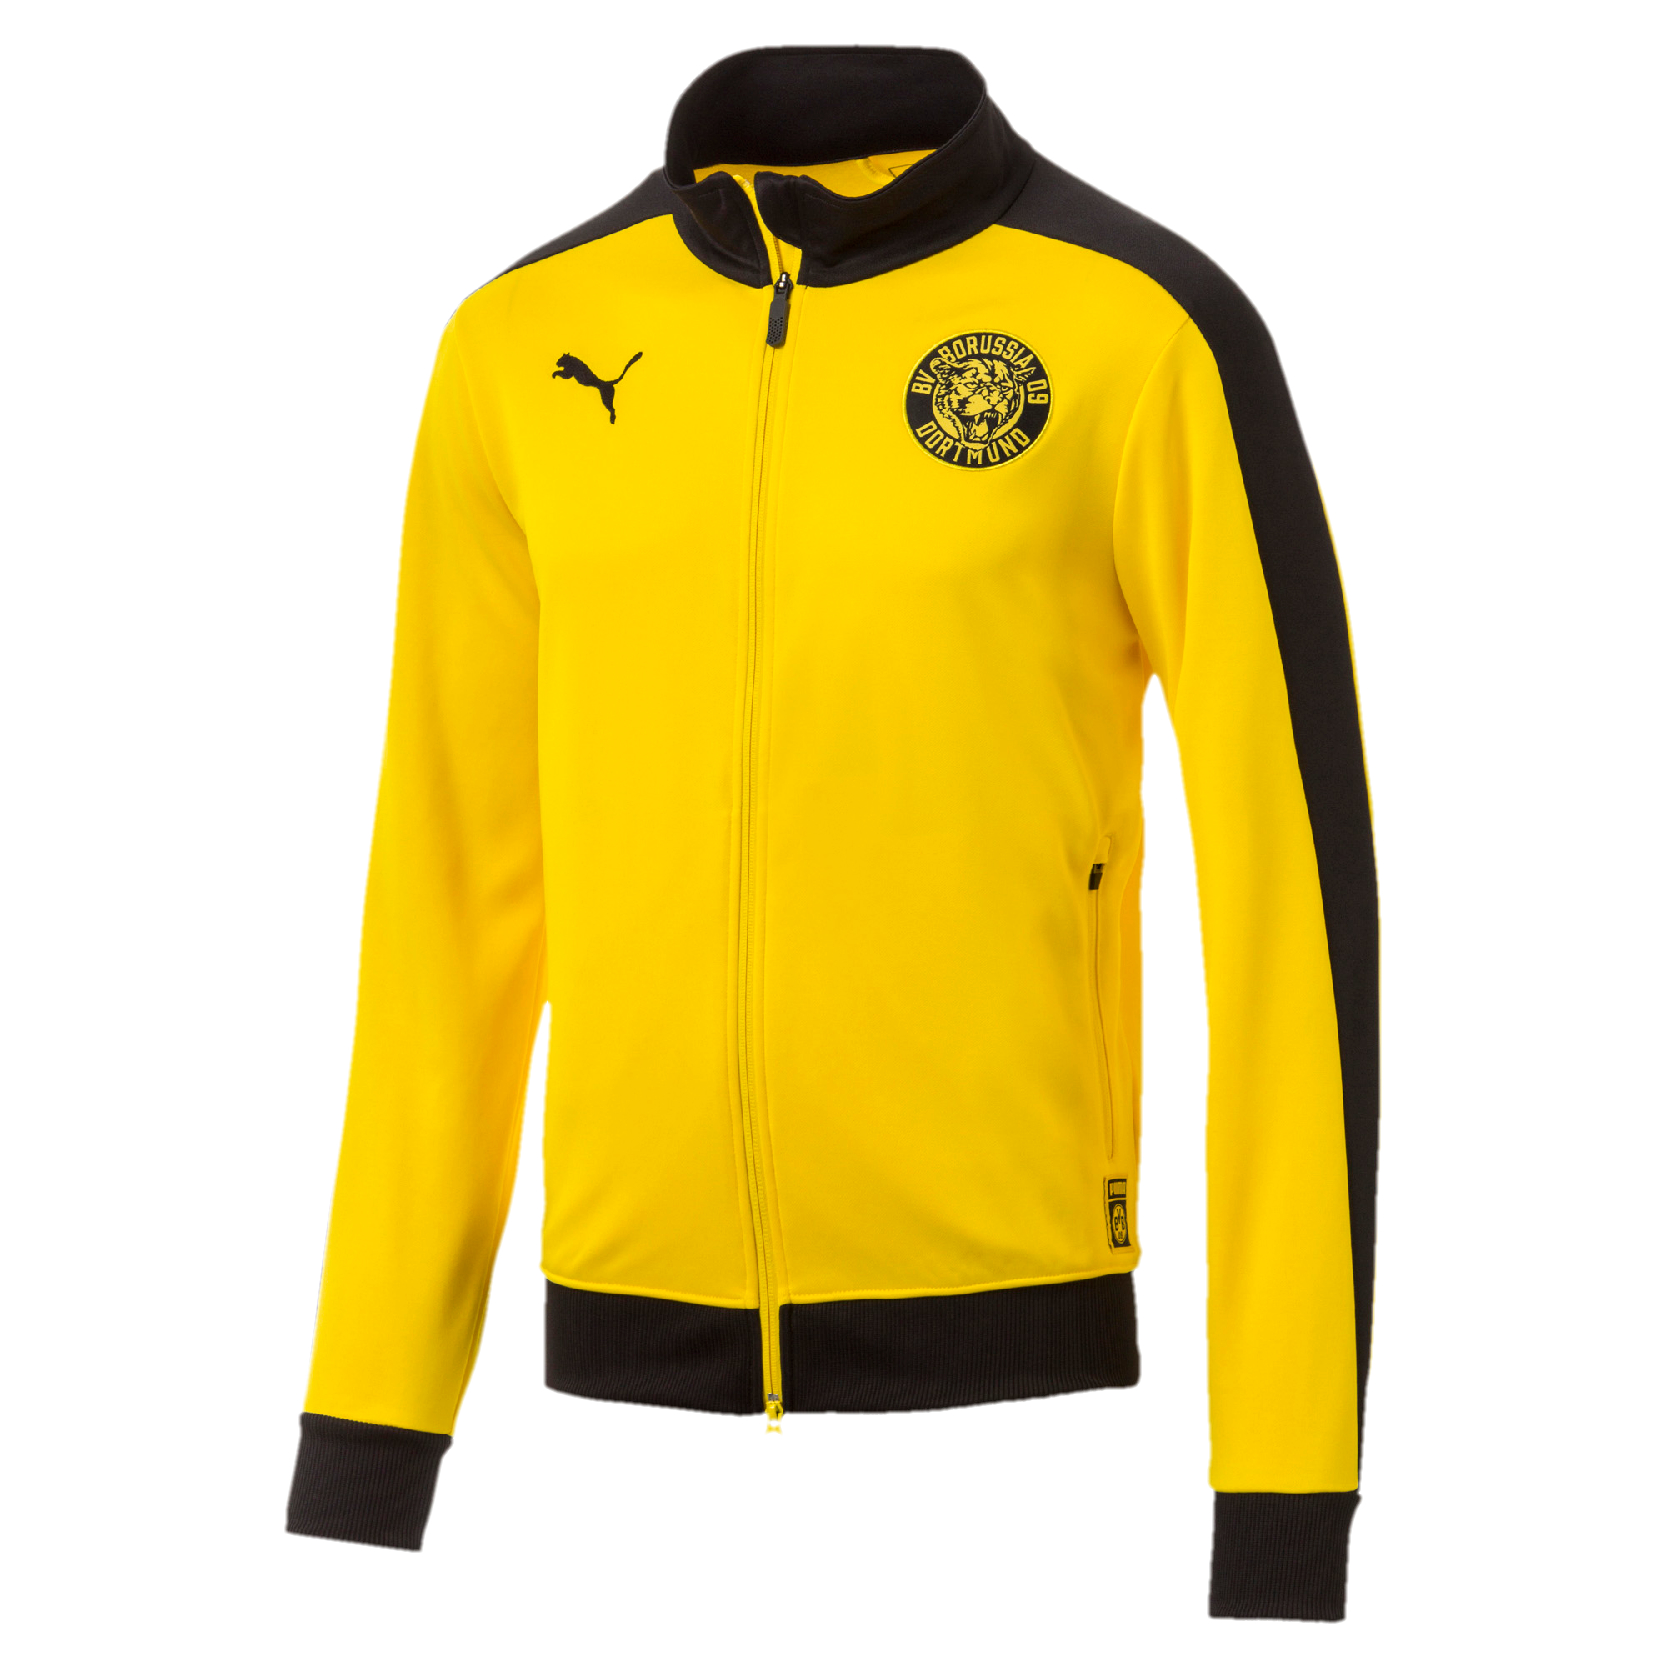 T7 01 Herren Bvb Puma Sweatjacke Track Borussia Dortmund Gelb 754101 Jacket e9HEDIYW2